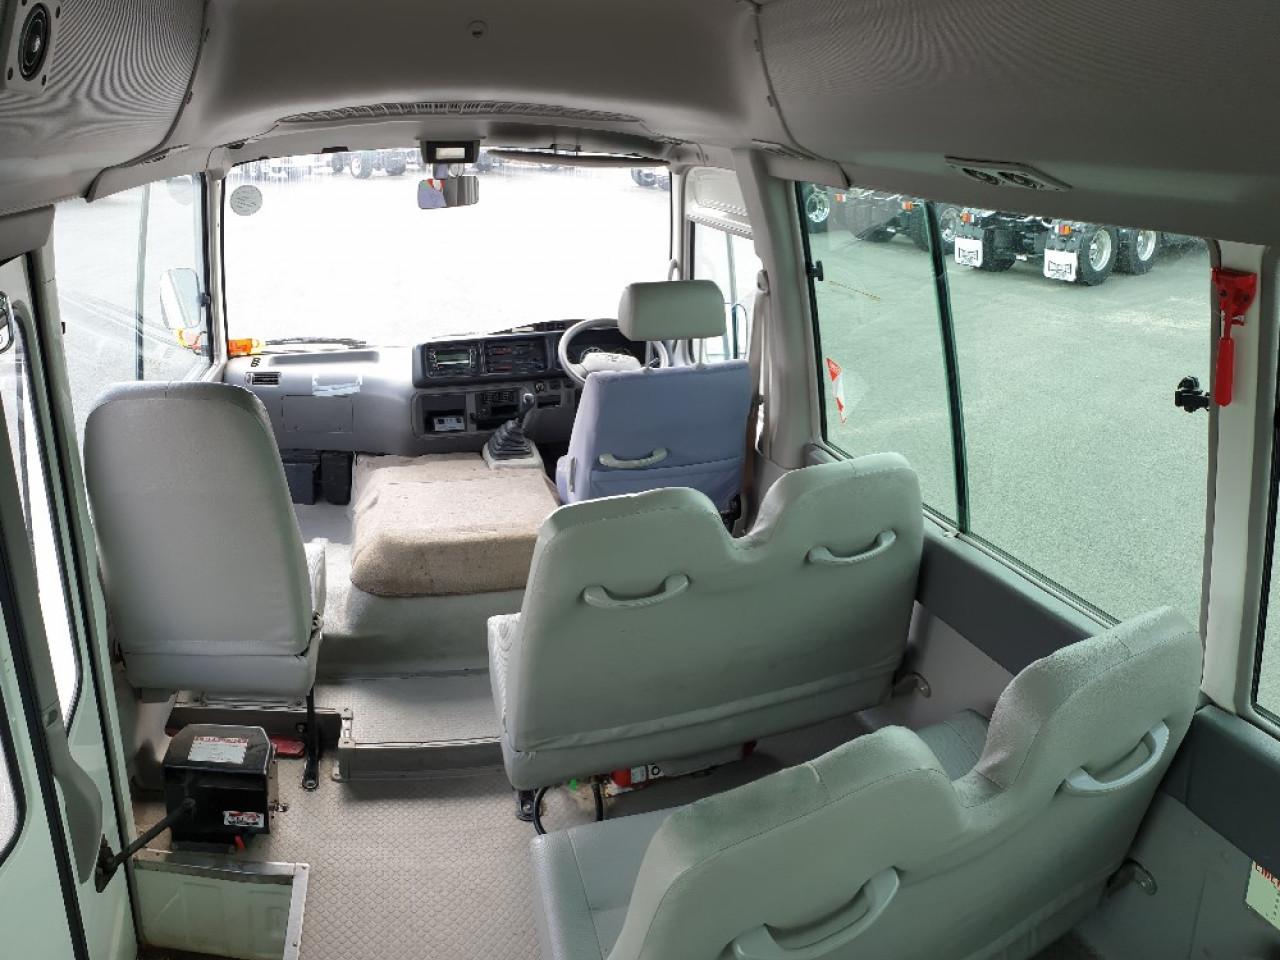 2011 Toyota Coaster Standard 21 Seats Bus